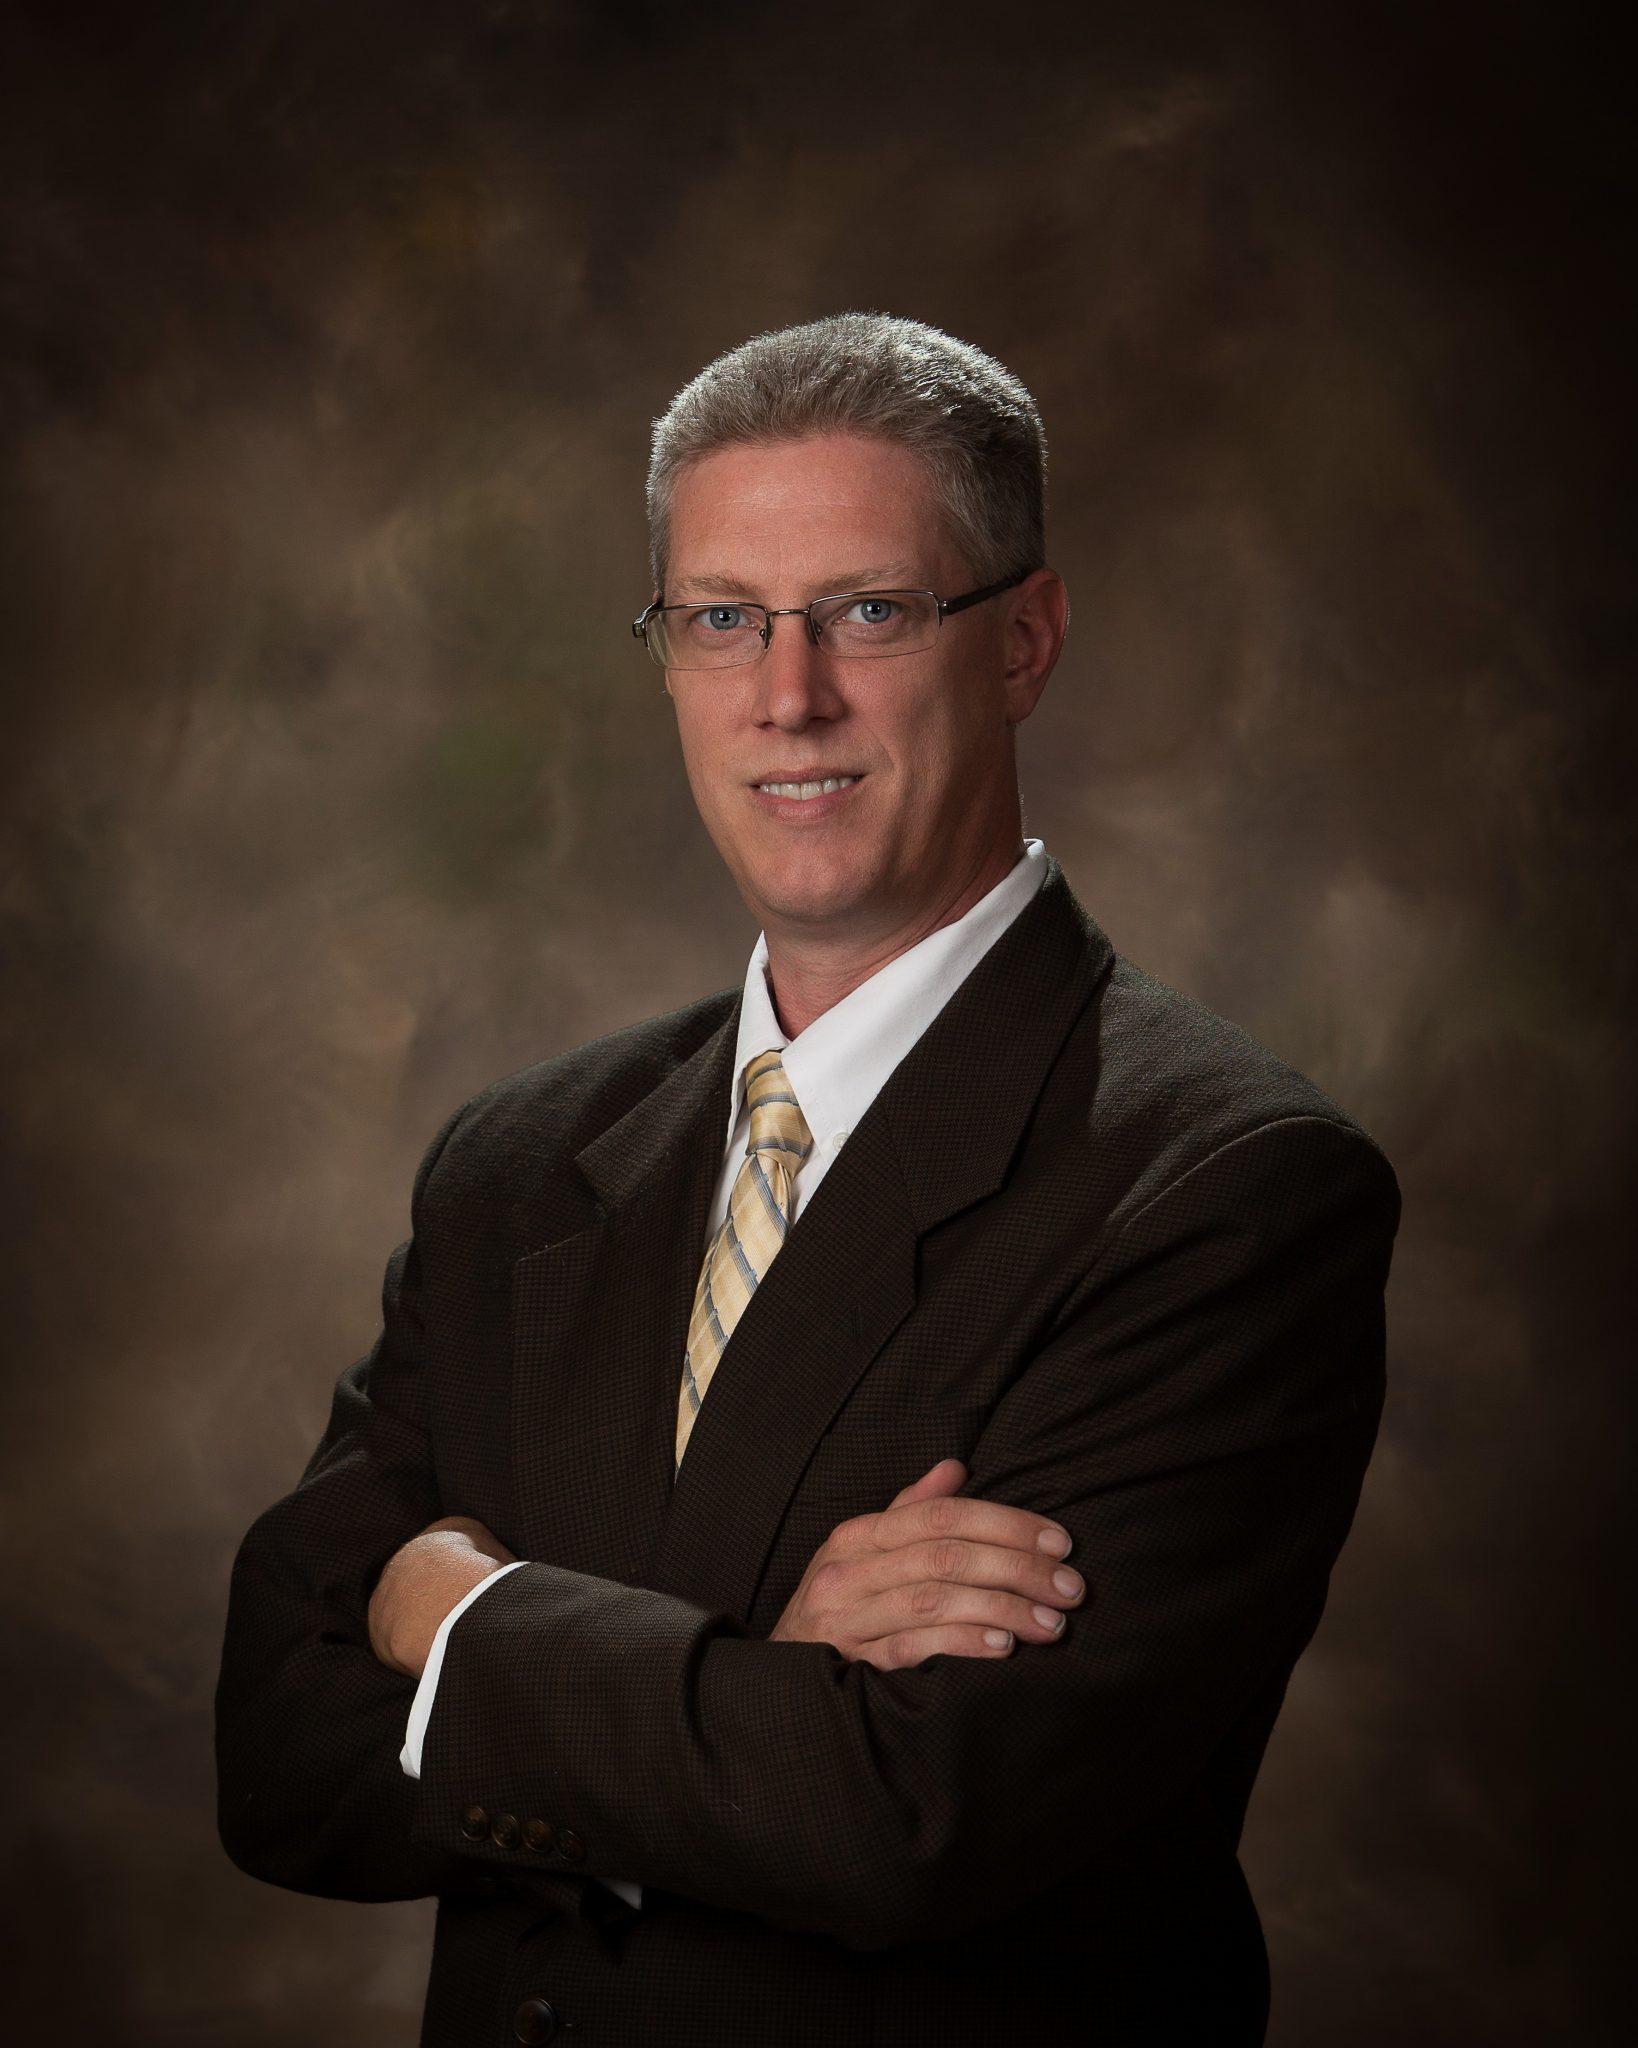 Brian Milleville, Regional Manager